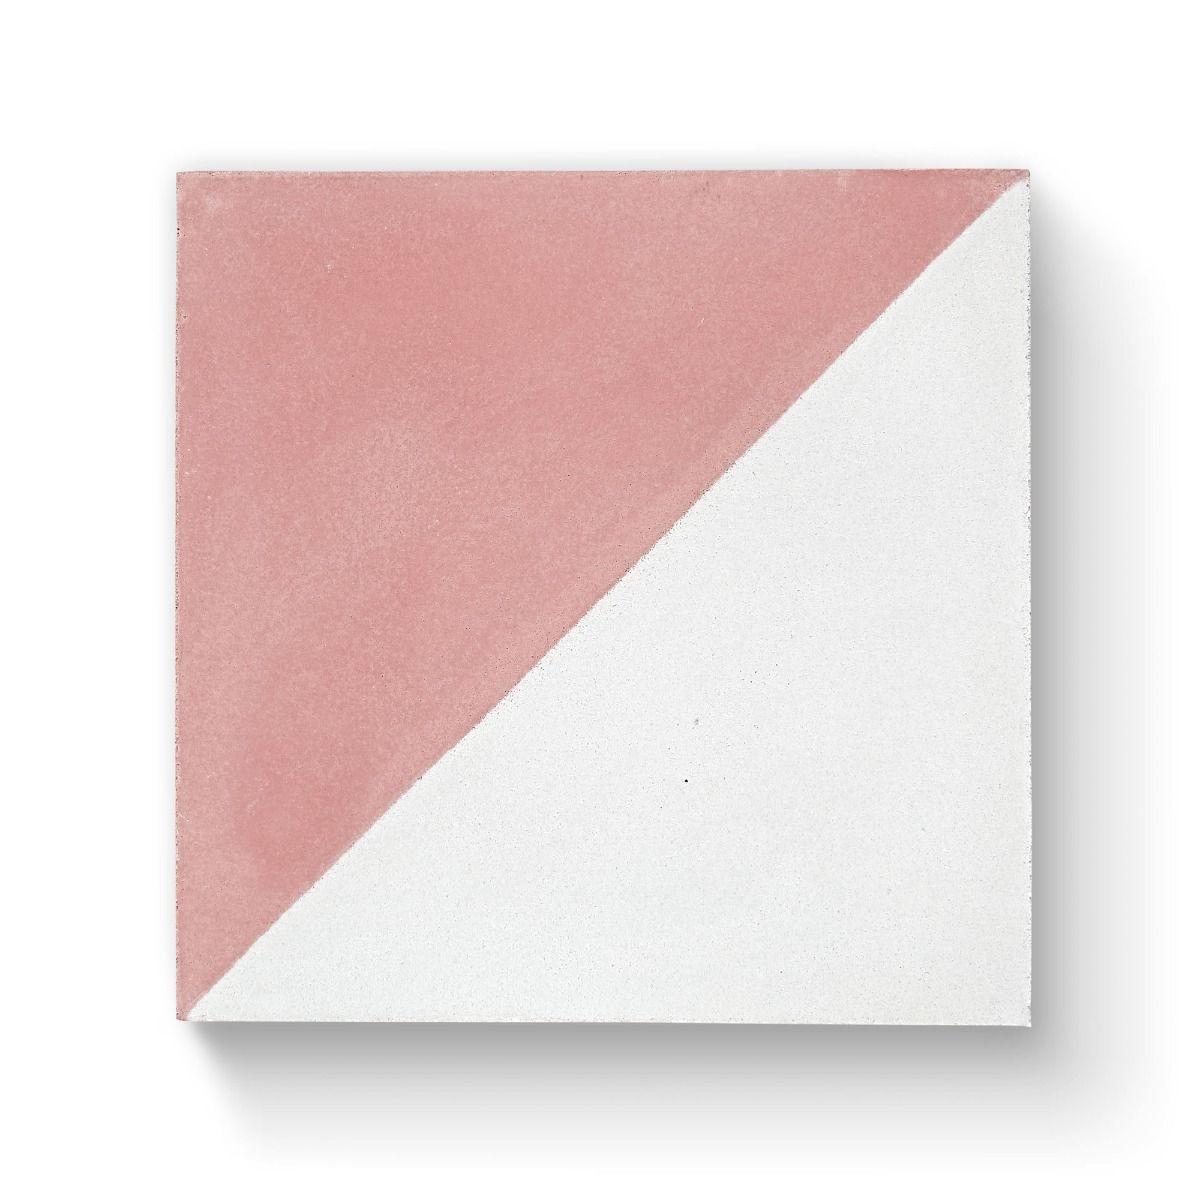 Bert & May Alalpardo Pink 20cm x 20cm